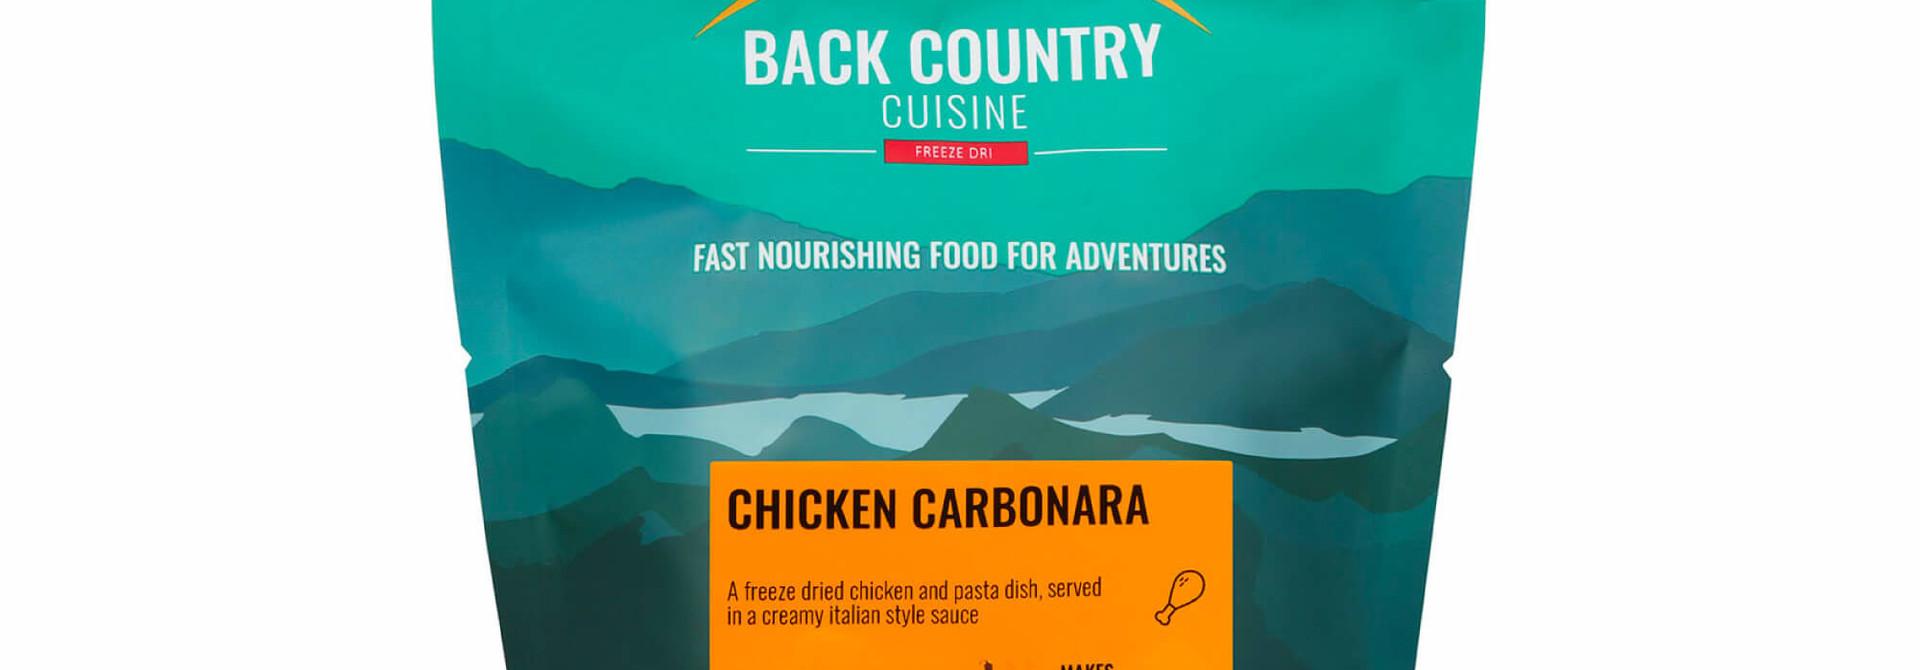 Back Country Cuisine Chicken Carbonara Regular